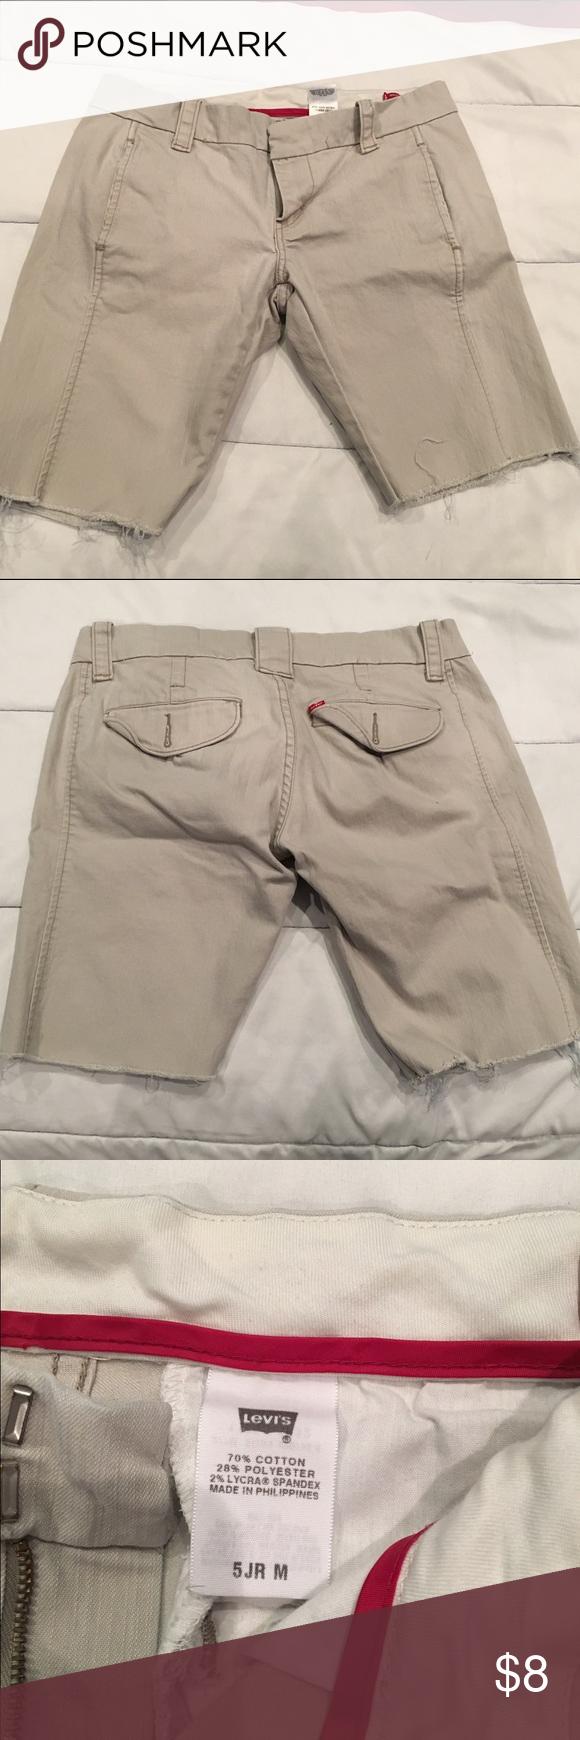 Levi Cut-offs Levi khaki cut-offs! They're about a 10 inch inseam. Shorts